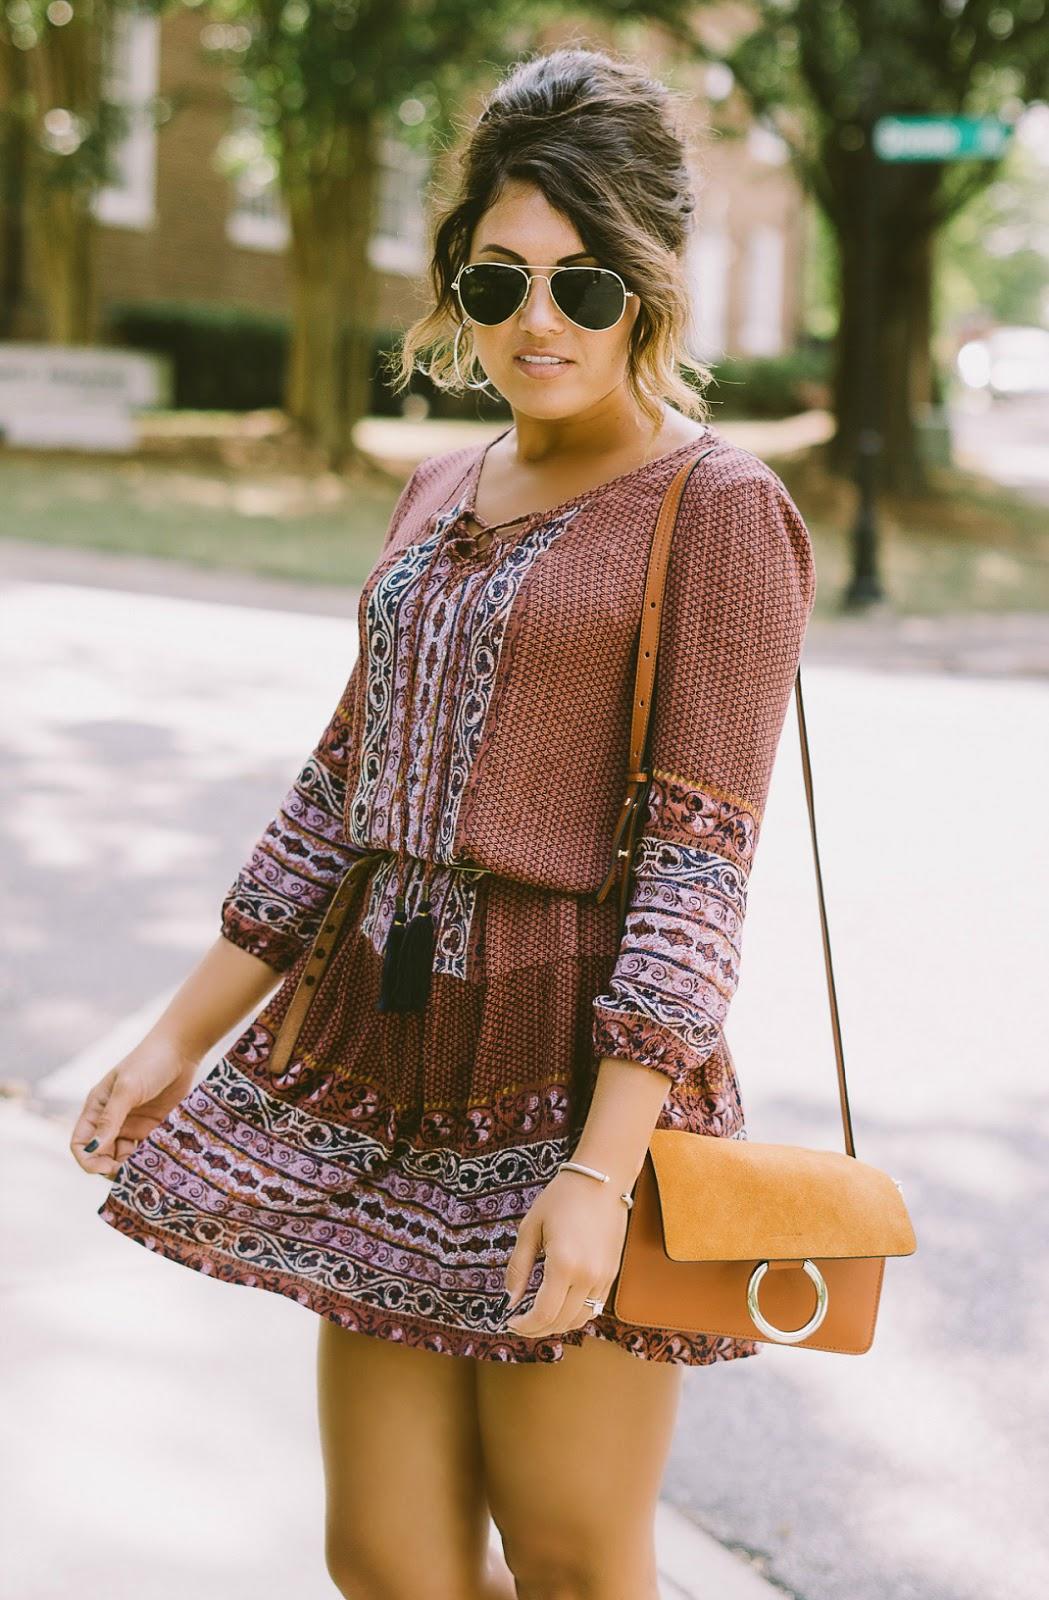 knox rose boho dress, chloe handbag, chloe handbag dupe, silver hoop earrings